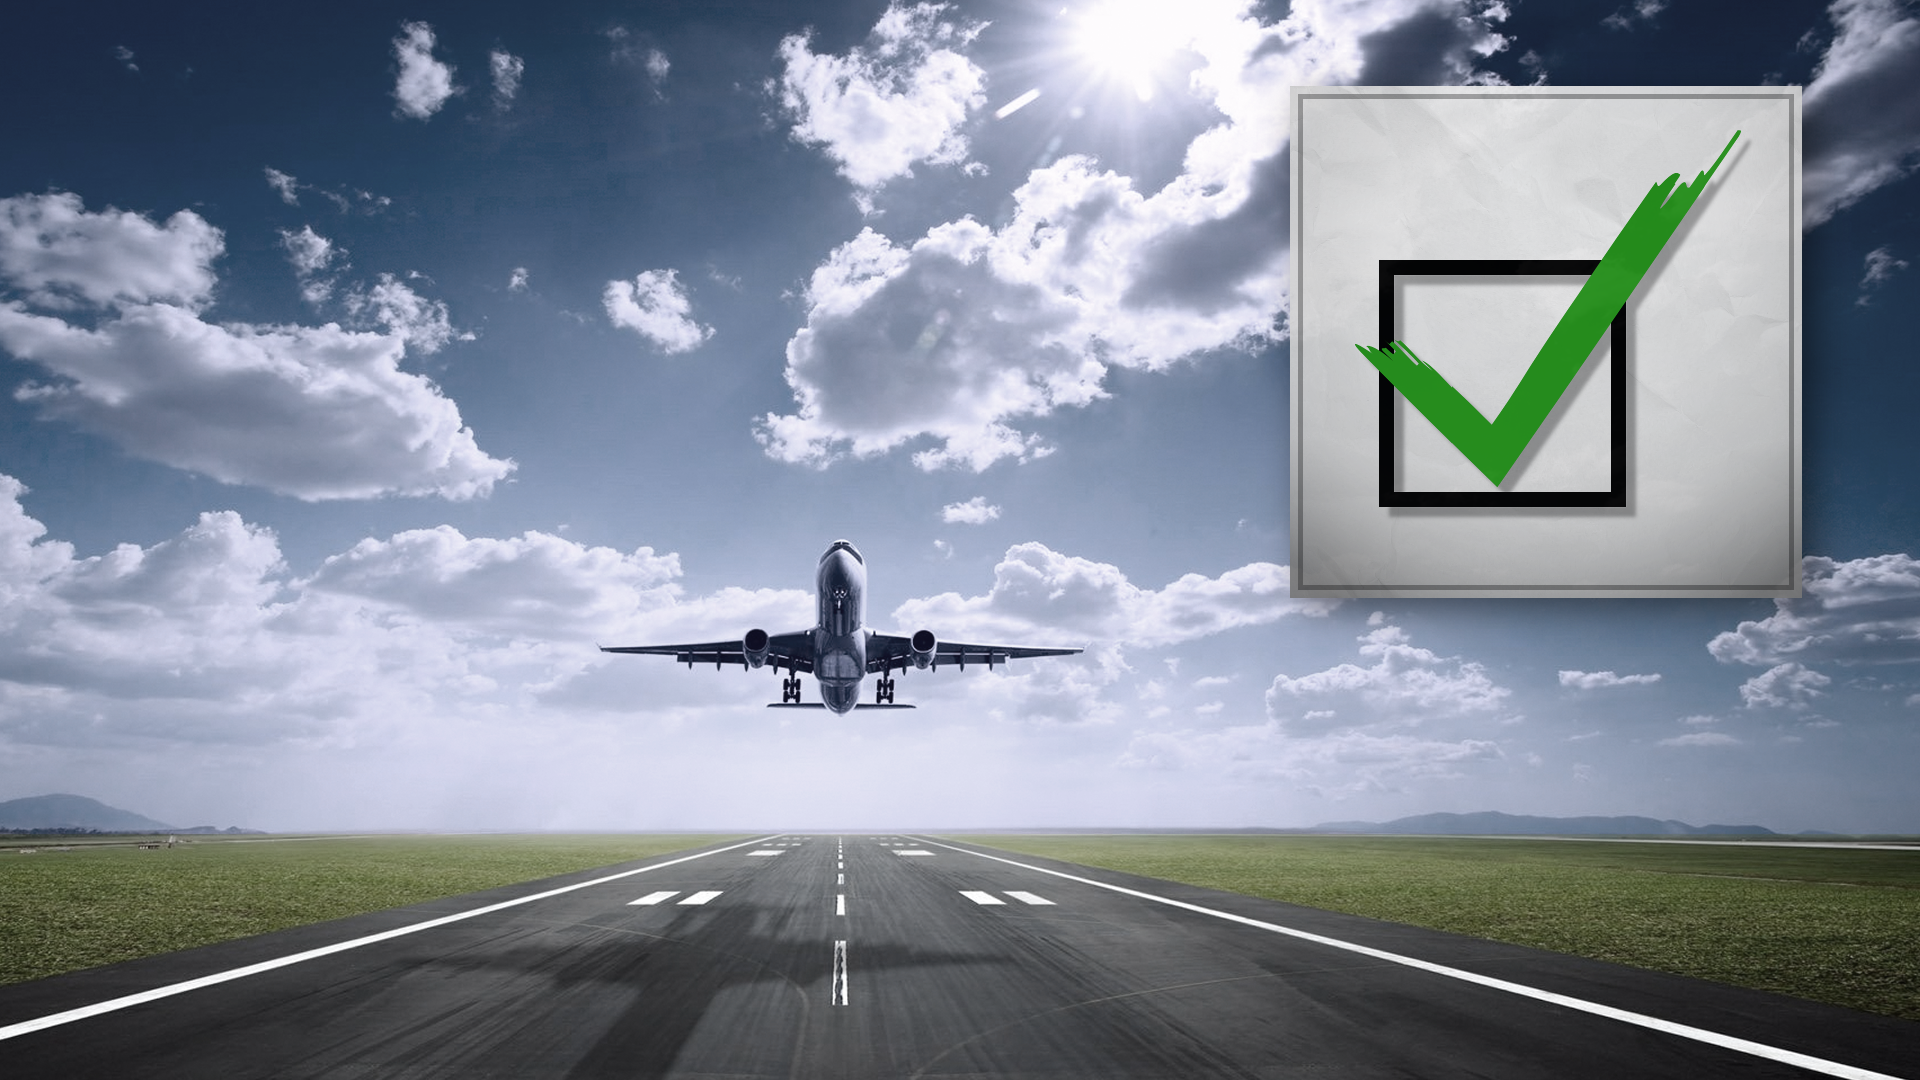 Xbox Airport Simulator 2019 achievements  Find your Xbox